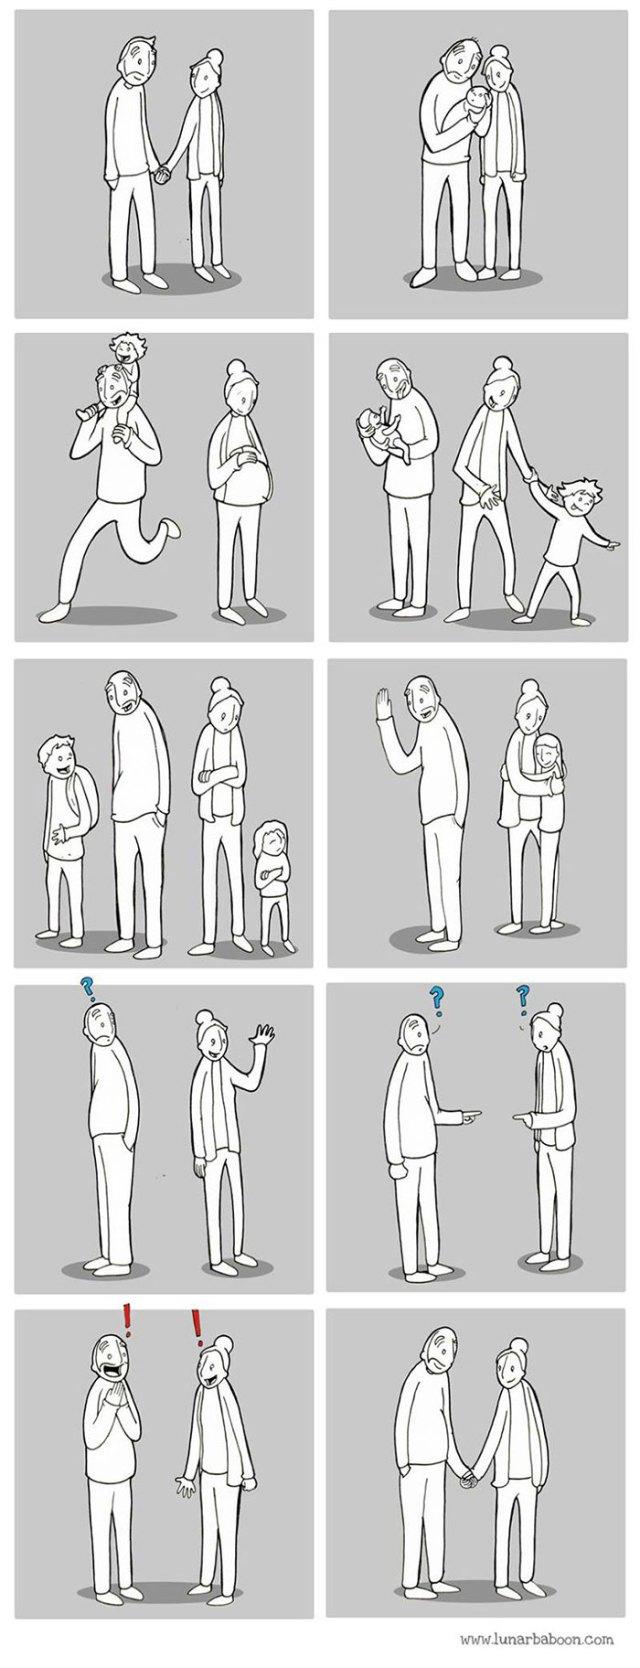 comics-padre-hijo-lunarbaboon- (9)